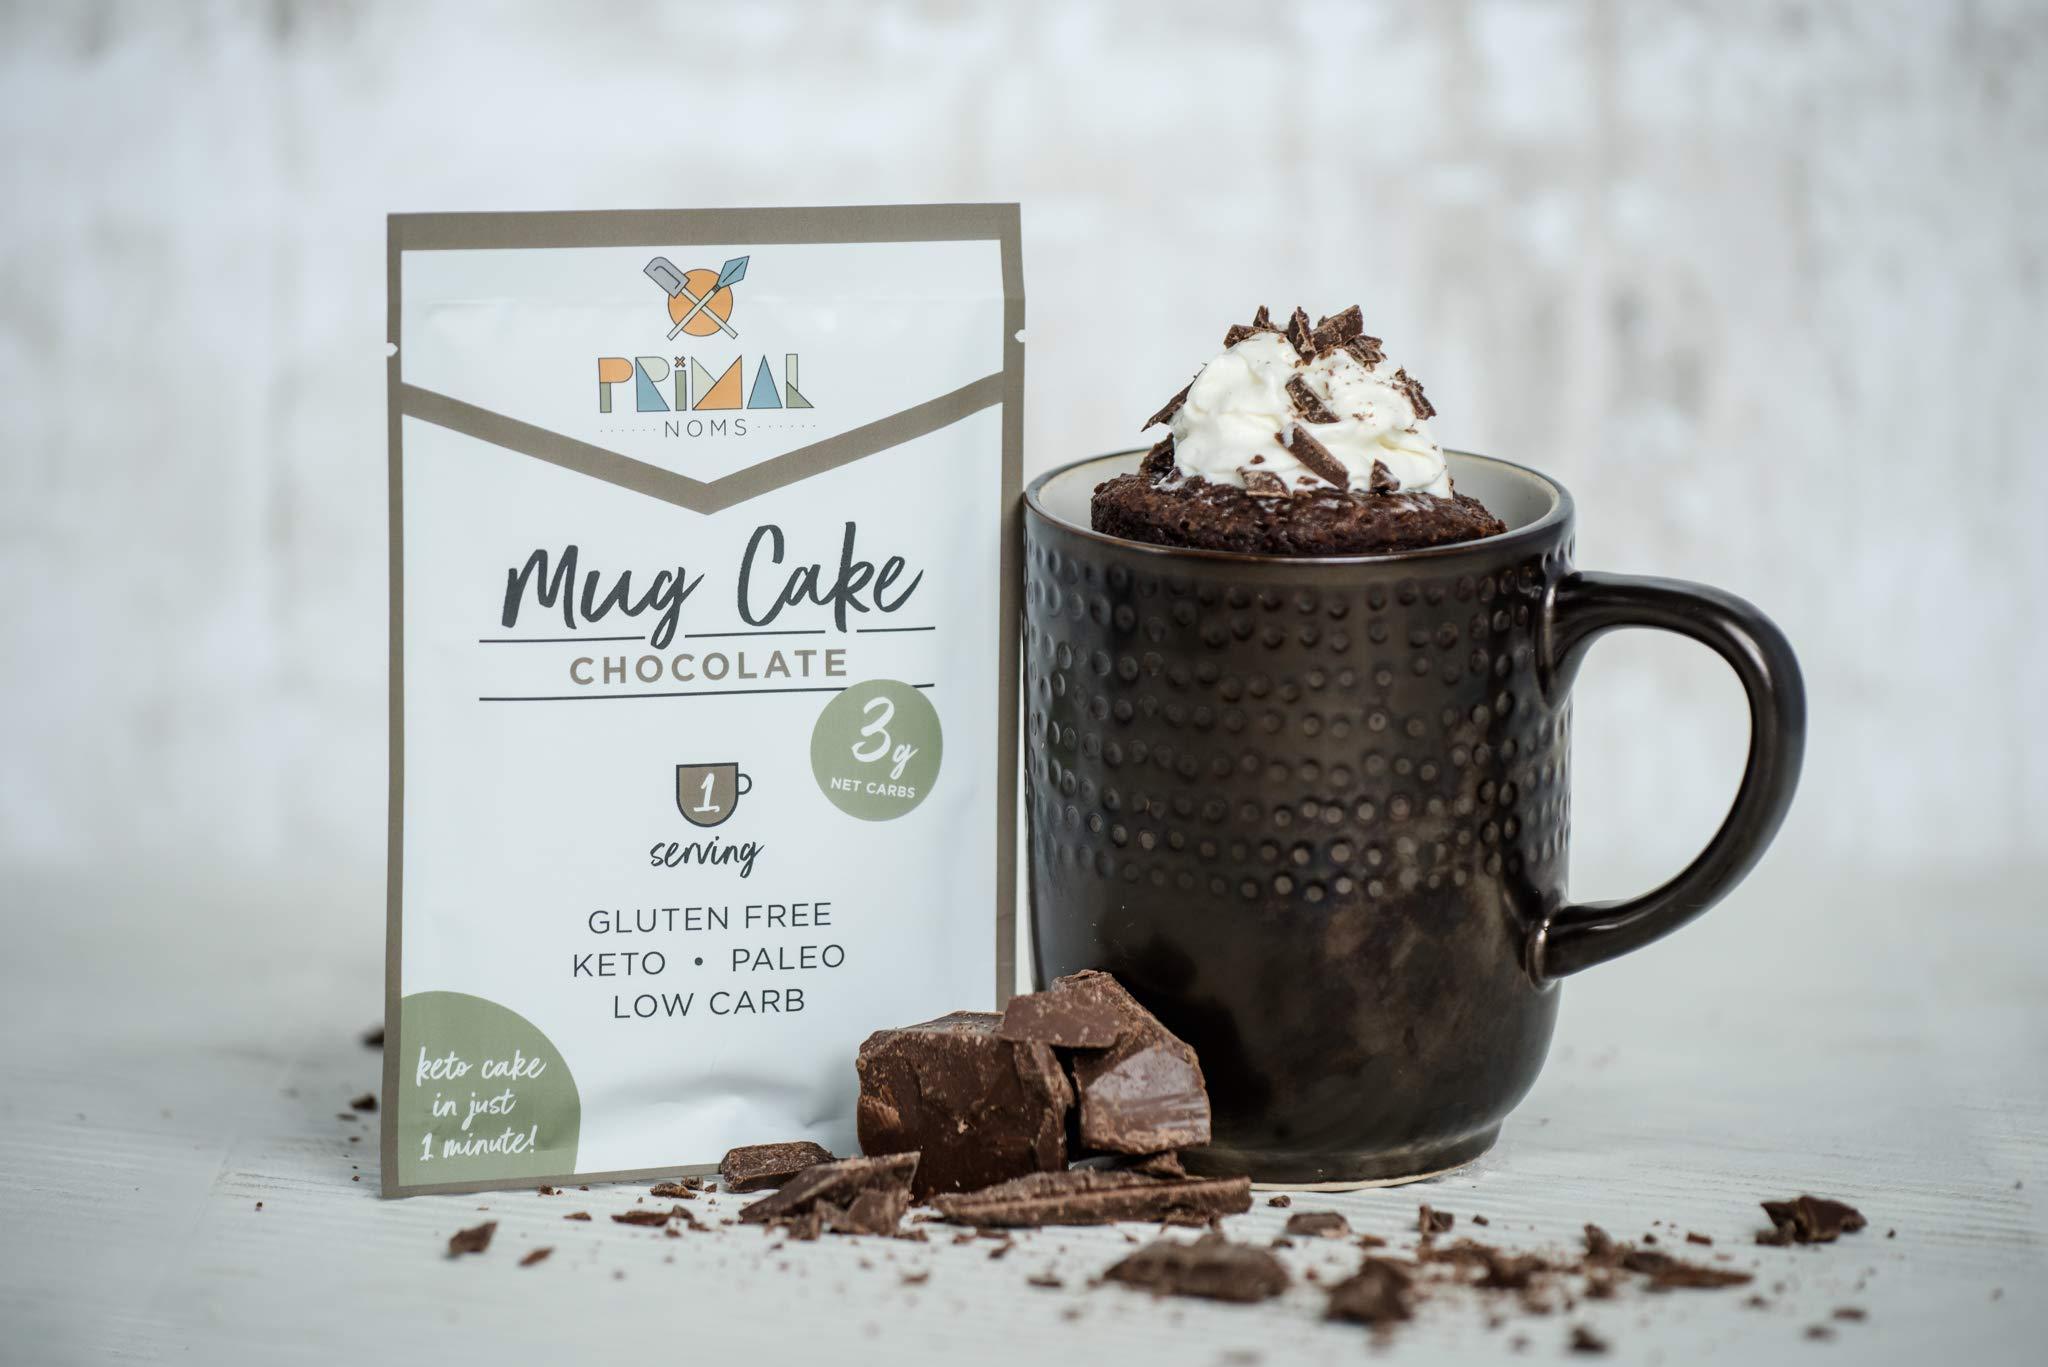 Primal Noms Keto Chocolate Mug Cake Dessert - 5 Pack | 4g Net Carbs | Keto Paleo Low Carb Diabetic Friendly | Sugar-Free | Gluten-Free | No Sugar Alcohols | No Artificial Sweetener by Primal Noms